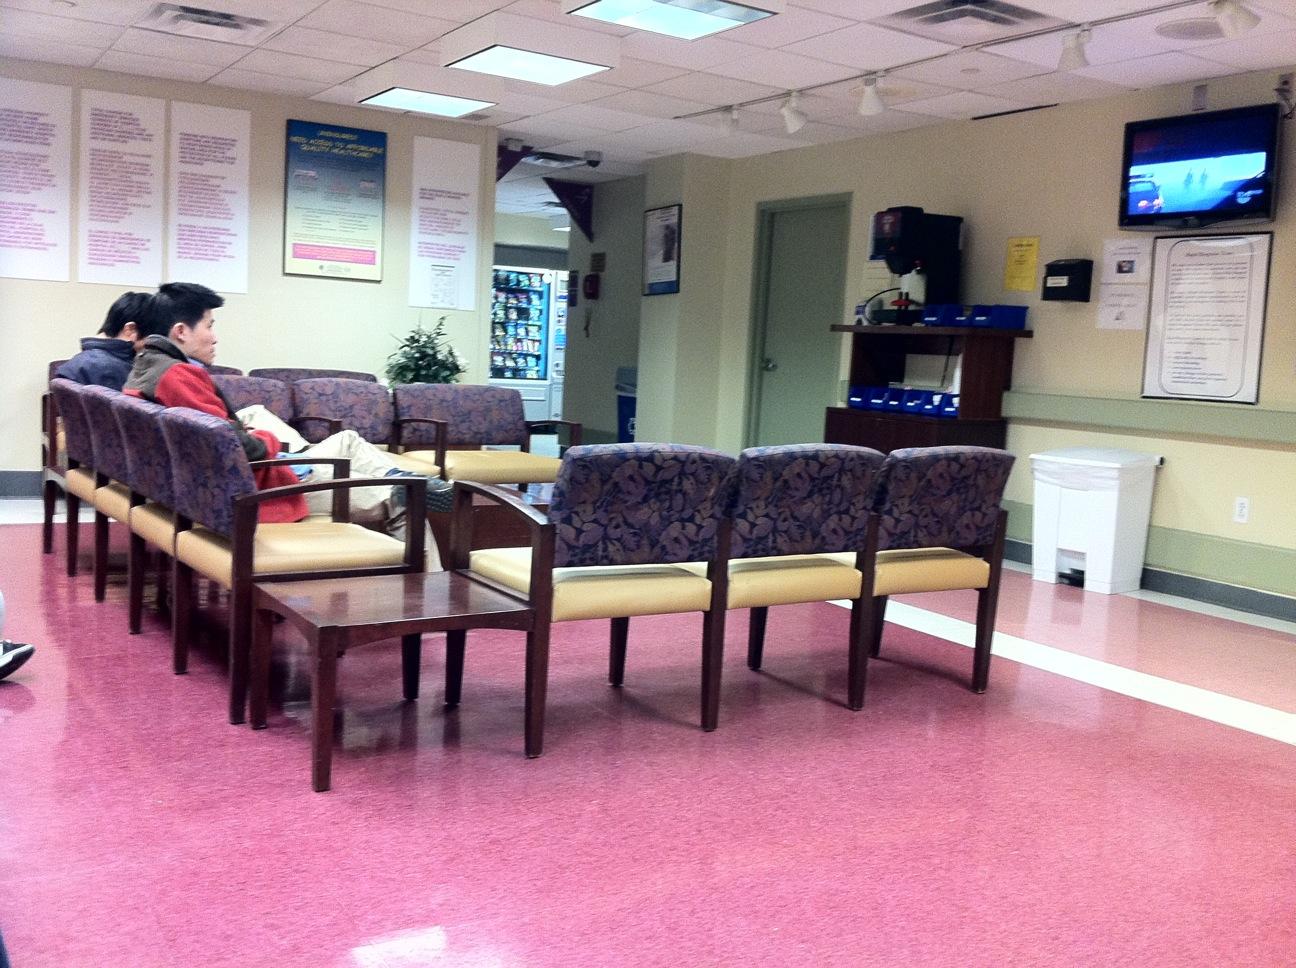 Akaharry S Moblog Hospital Emergency Waiting Room